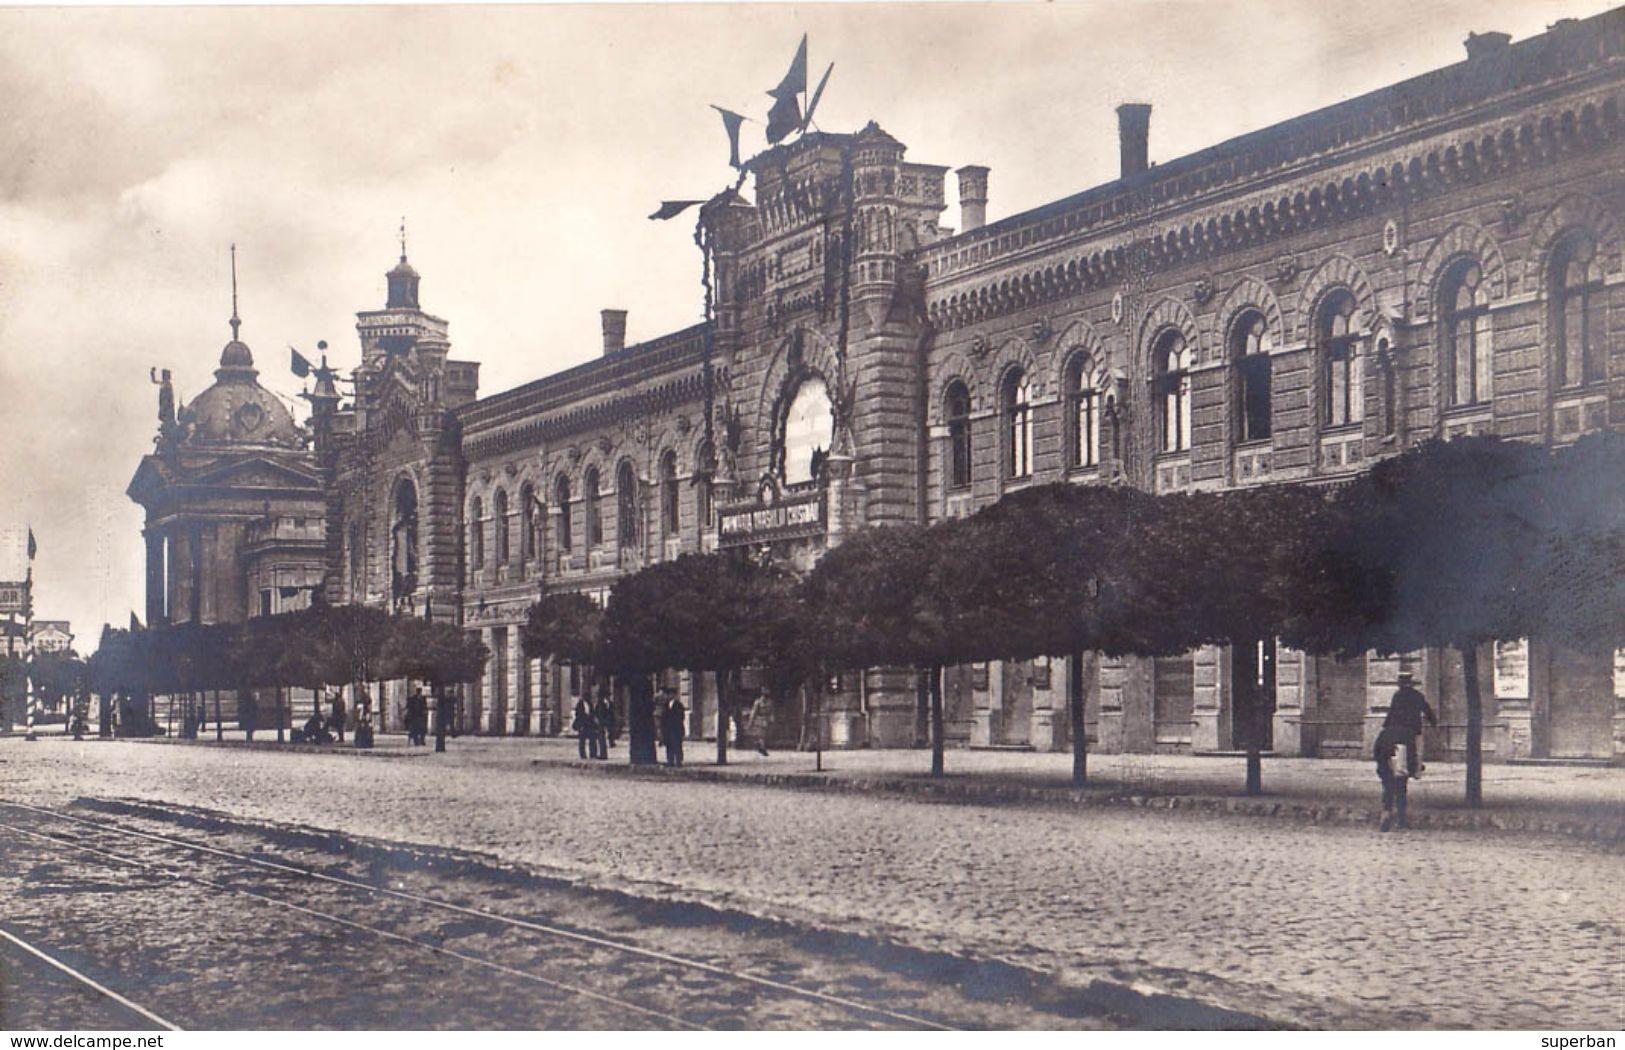 BASARABIA : CHISINAU / KISHINEV / KICHINEW : PASSAGE DE L'HOTEL DE VILLE - CARTE VRAIE PHOTO / REAL PHOTO ~ 1920 (ab514) - Moldavie